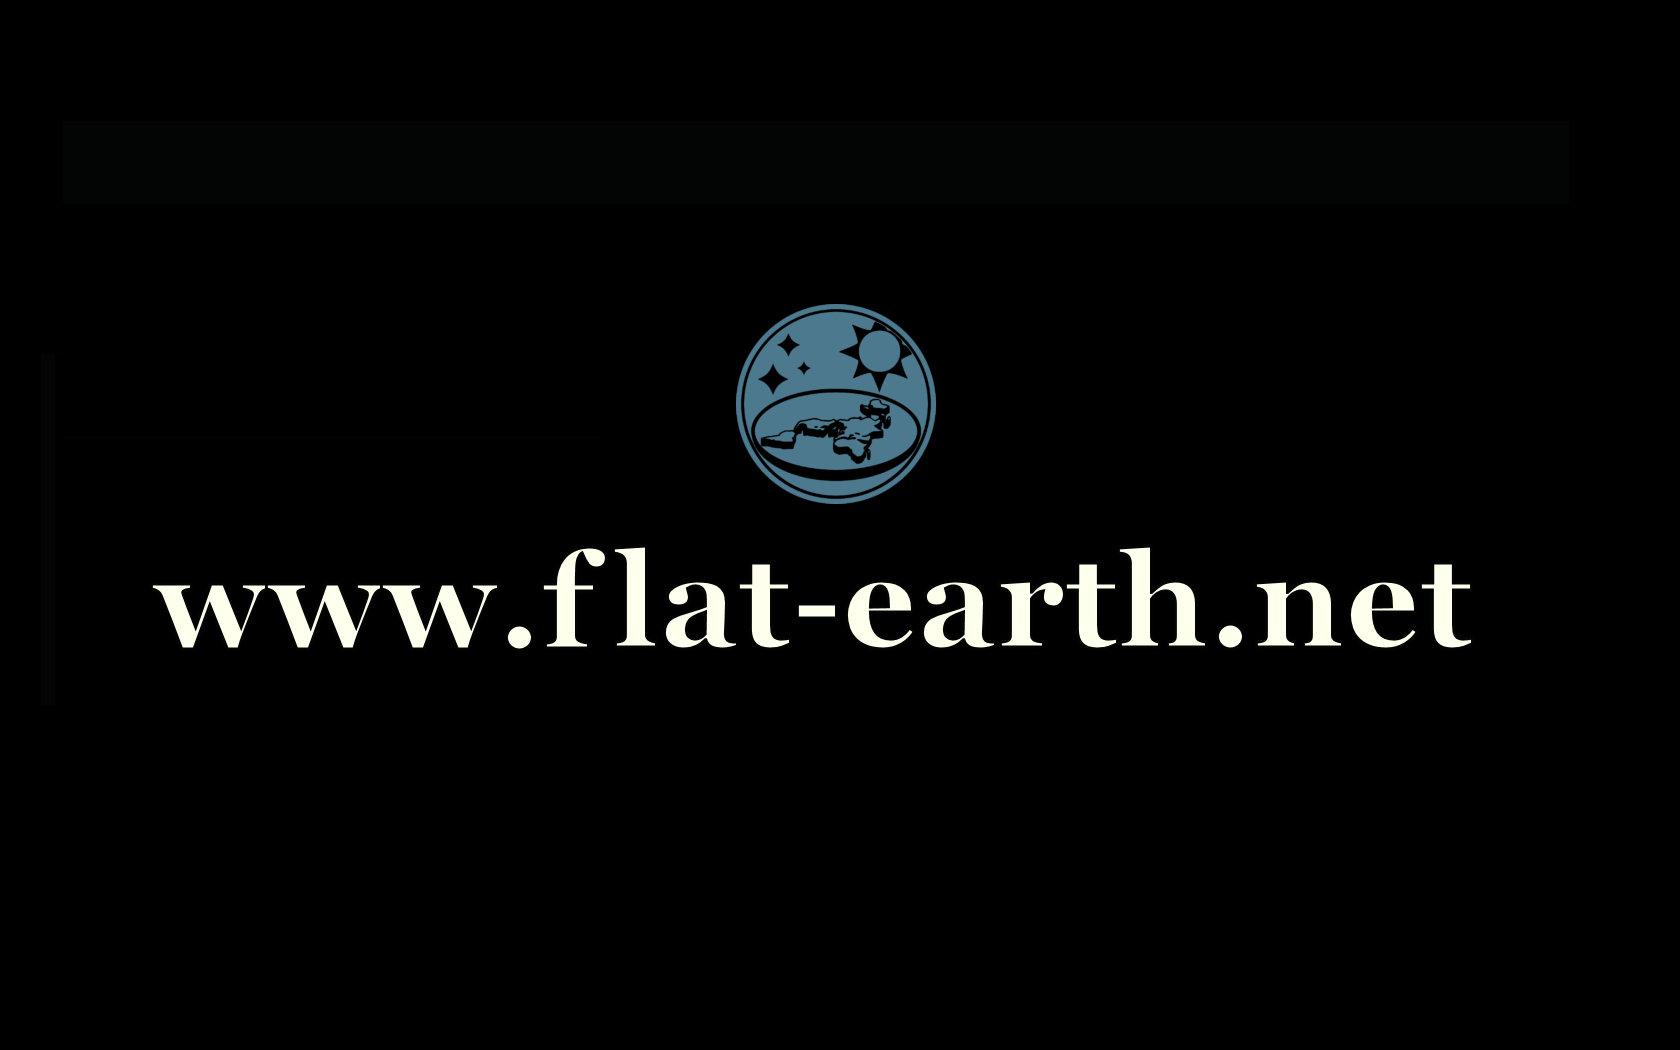 Domena flat-earth.net [PŁASKA ZIEMIA]